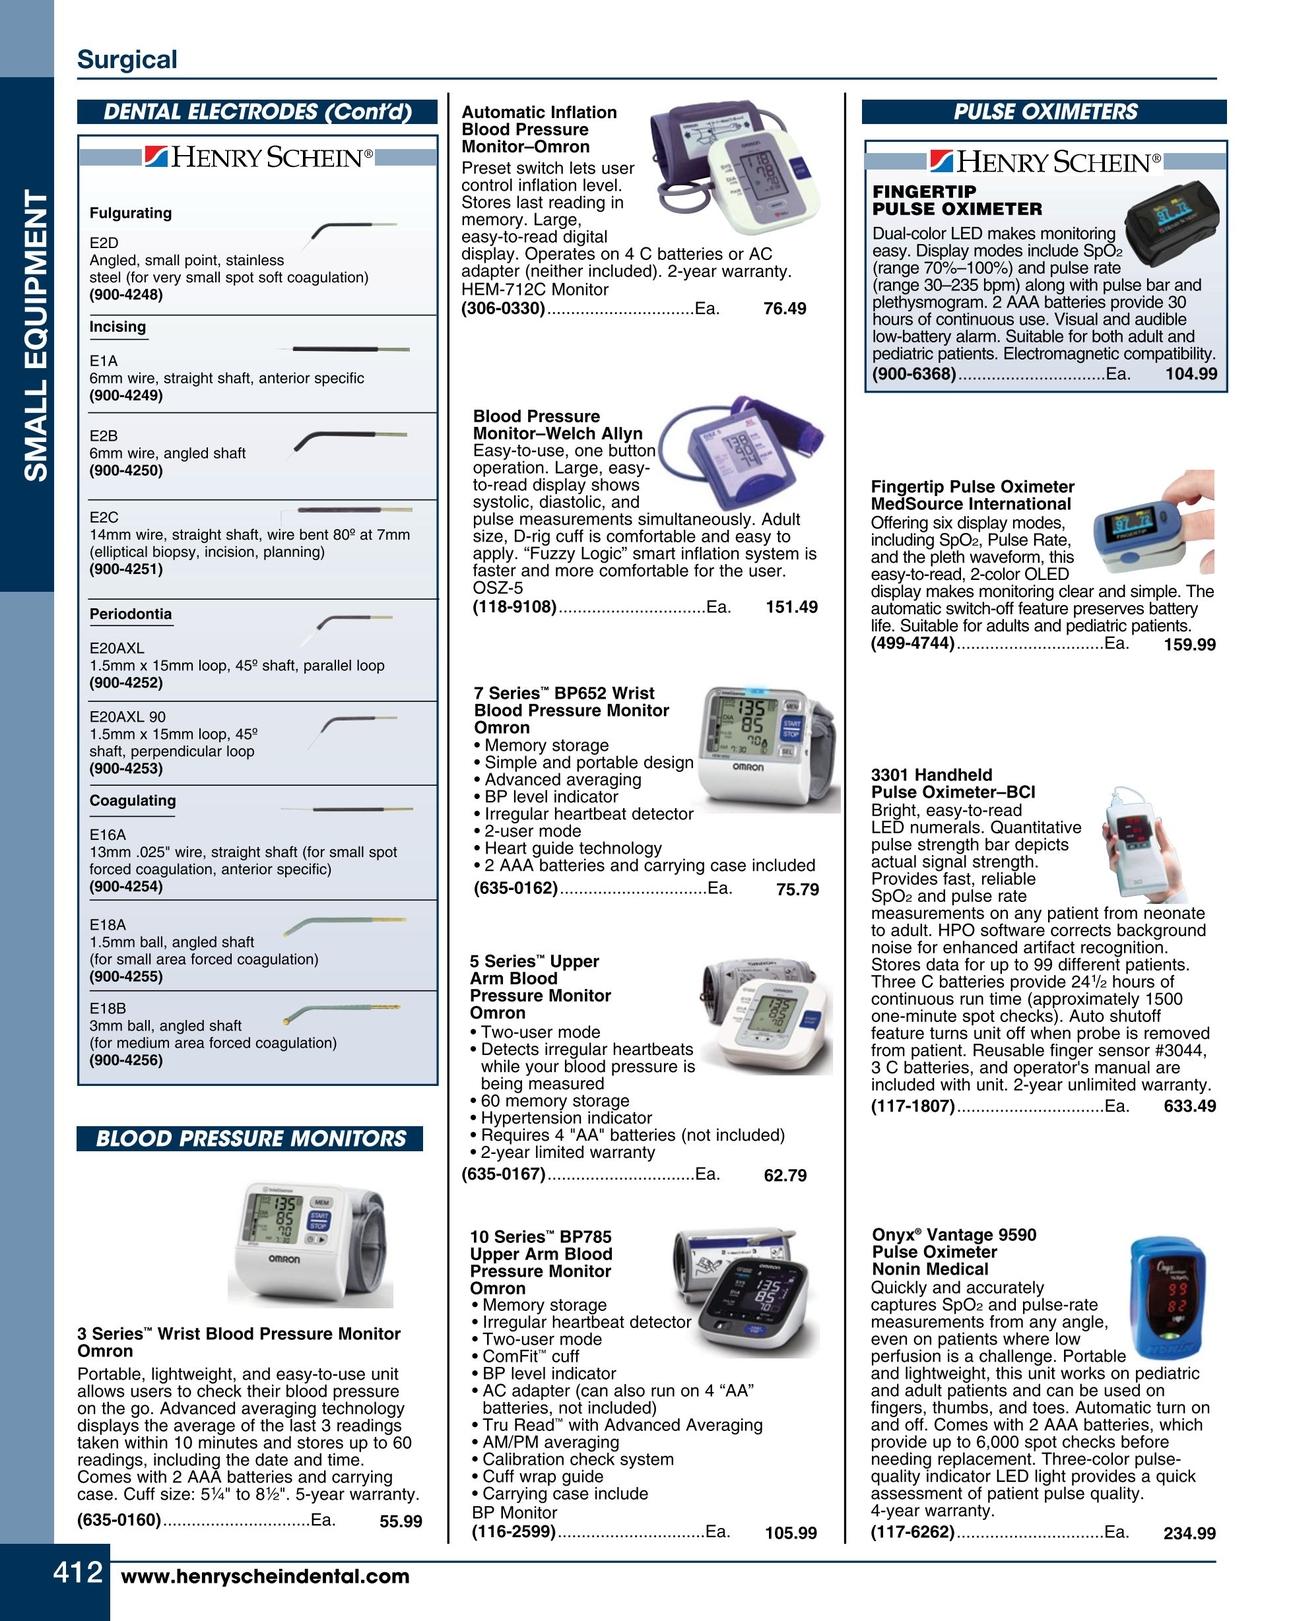 2014 Merchandise Catalog